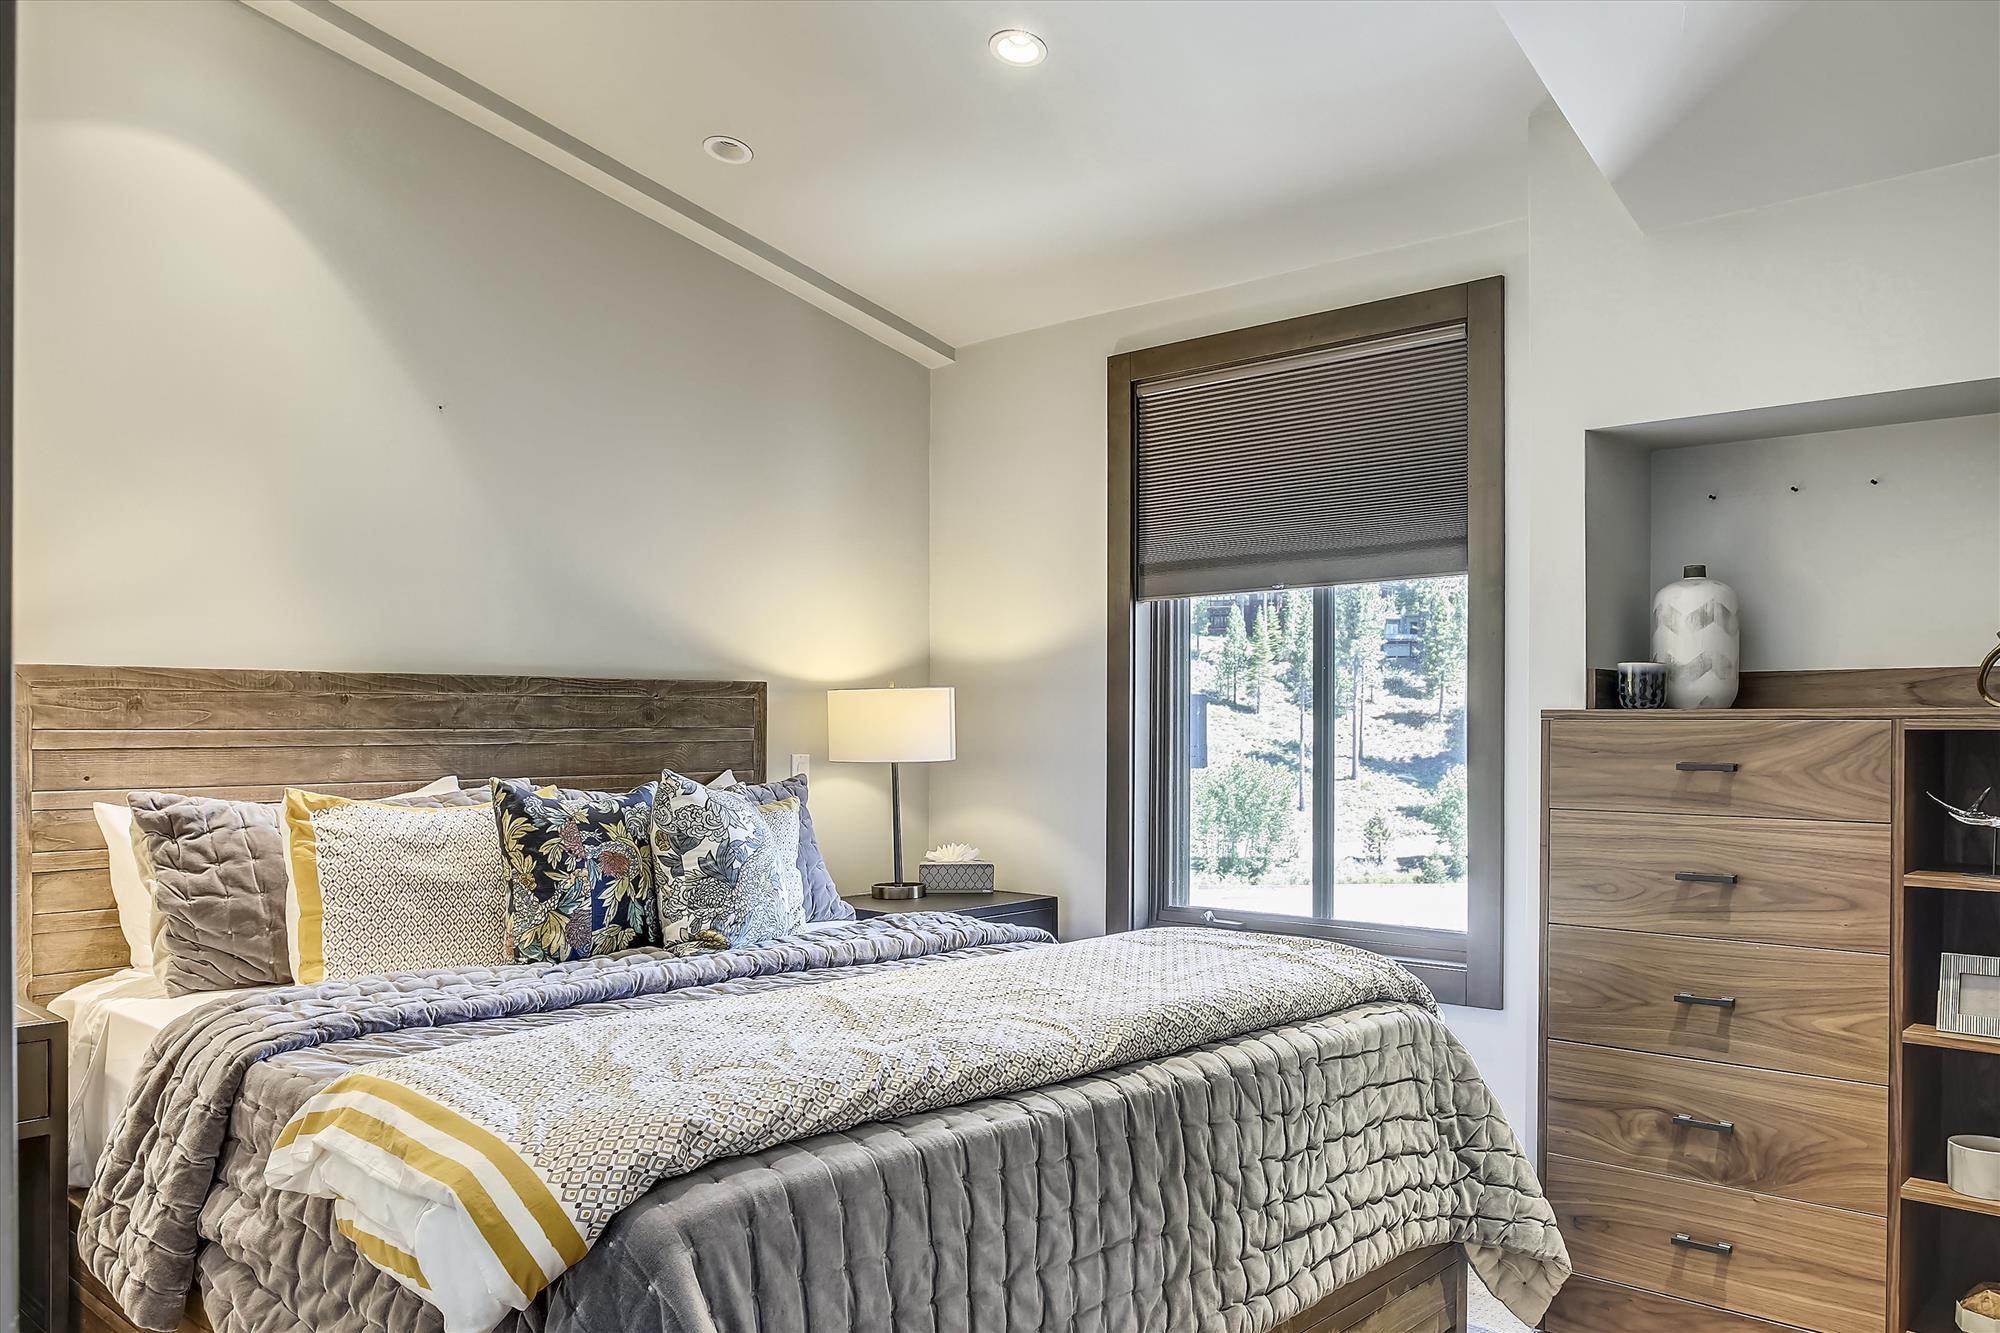 Tahoe Vacation Rentals - Alpine Meadows, CA 96146 - (530)583-3550 | ShowMeLocal.com